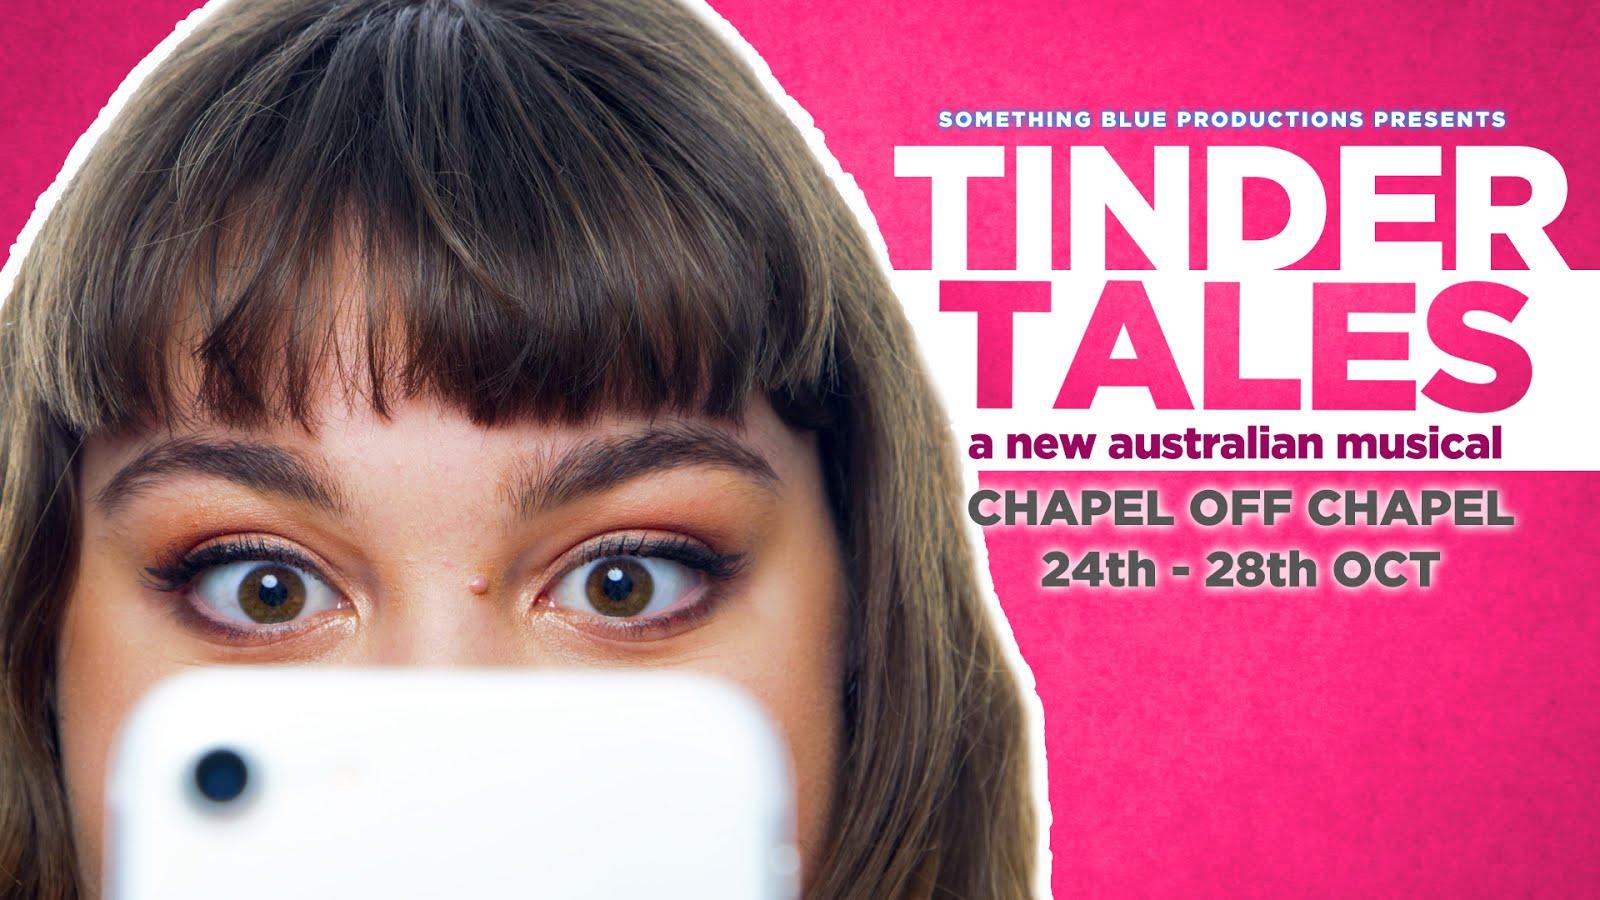 TINDER TALES - A hopeless romantic...